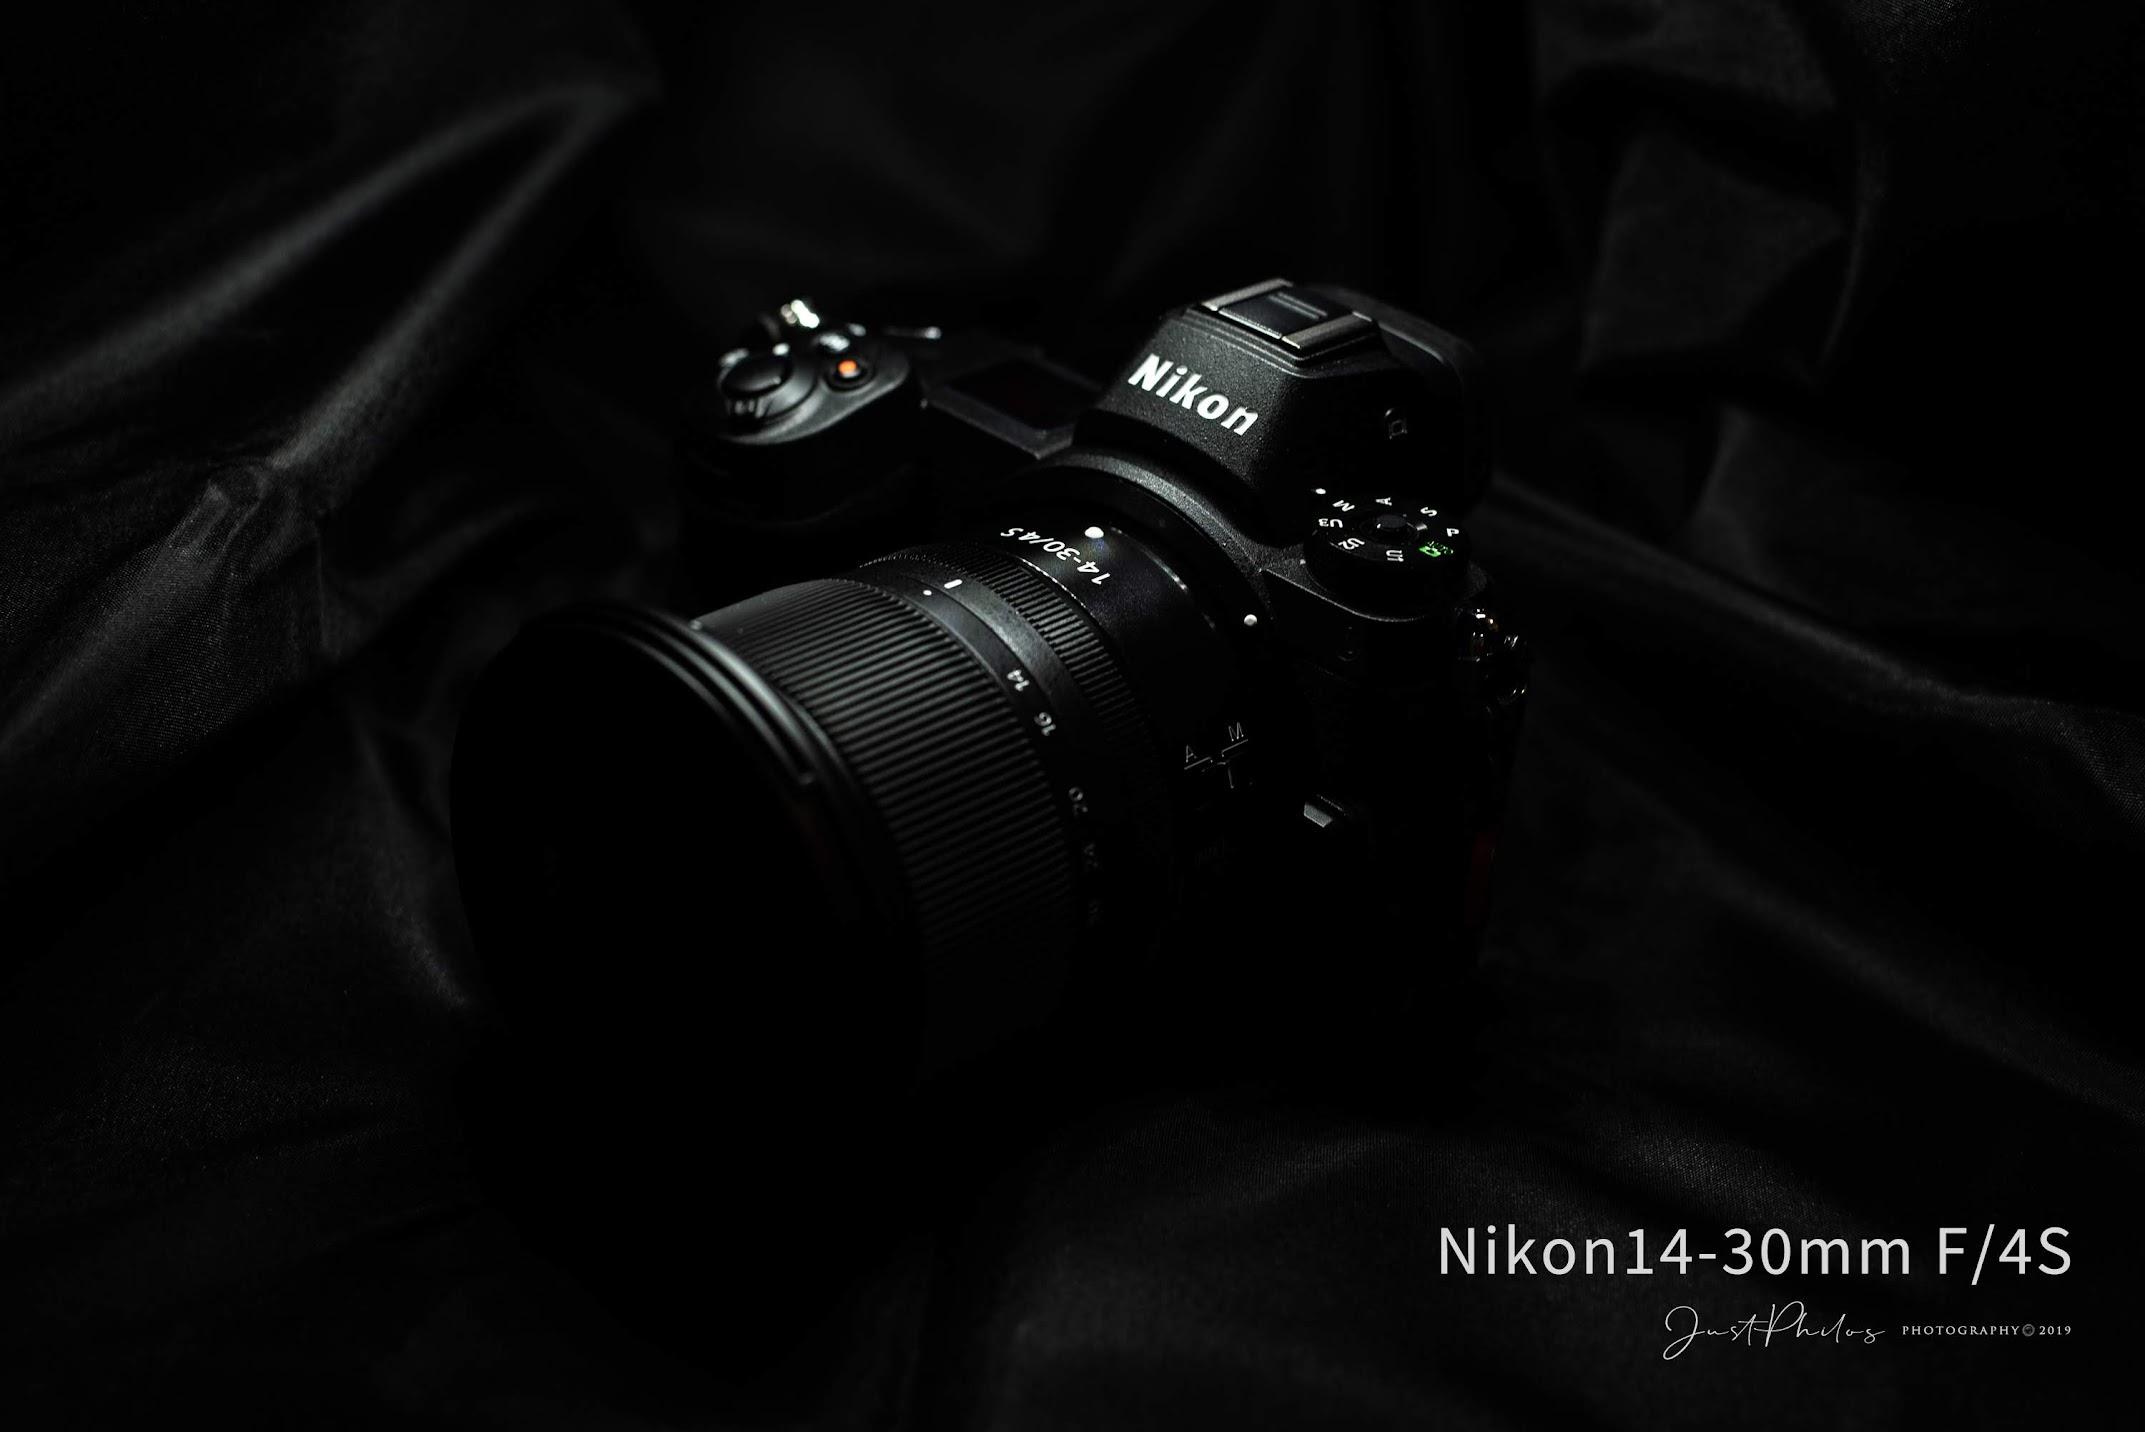 Nikon Z 14-30mm F/4S搭配Nikon Z6非常適合,幾乎是外出拍照的標準配備。